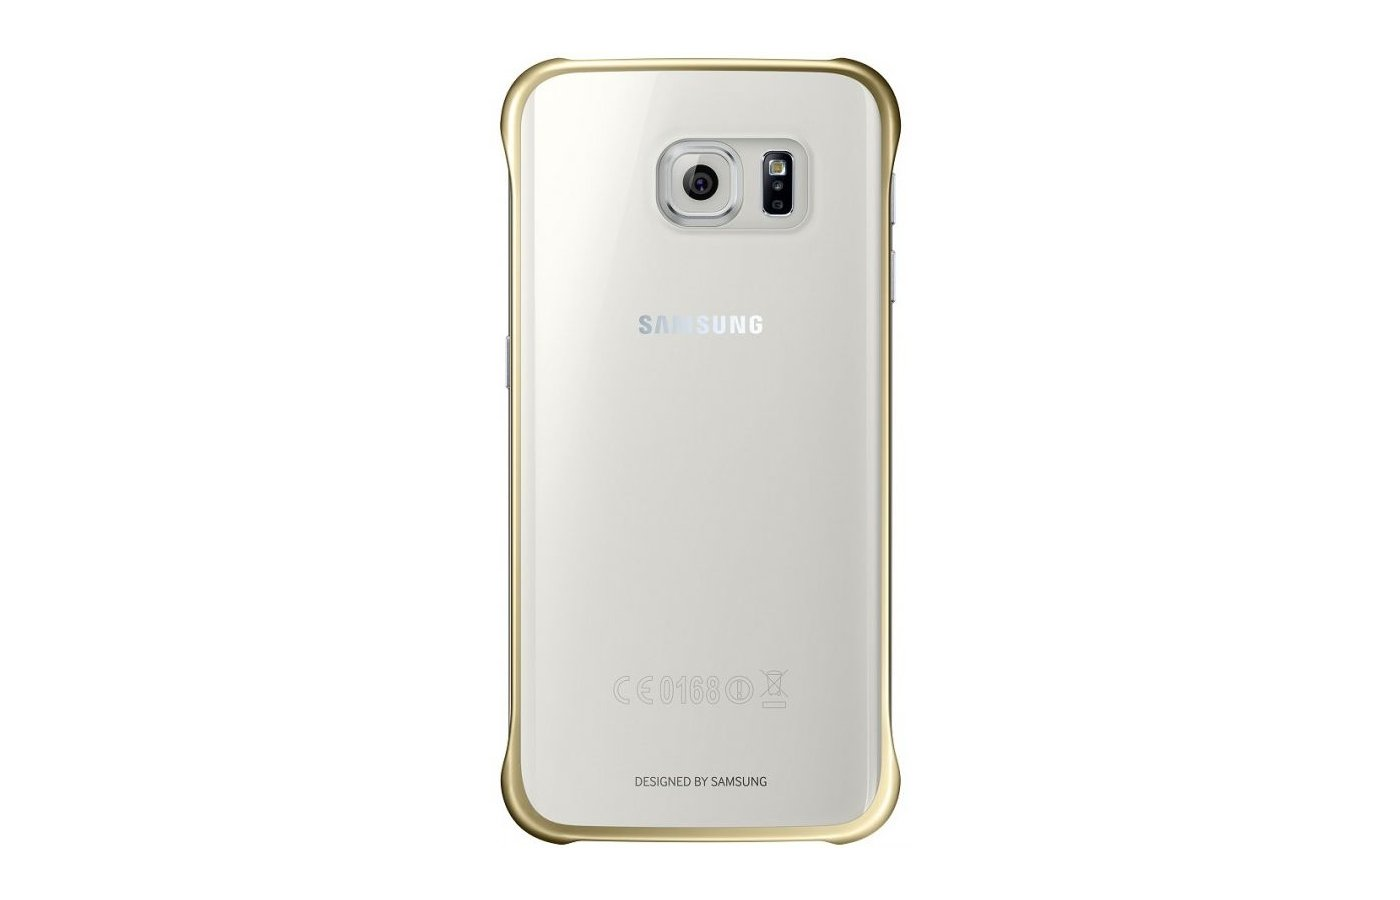 Чехол Samsung Protective Cover для Galaxy S6 Edge (SM-G925) (EF-QG925BFEGRU) gold